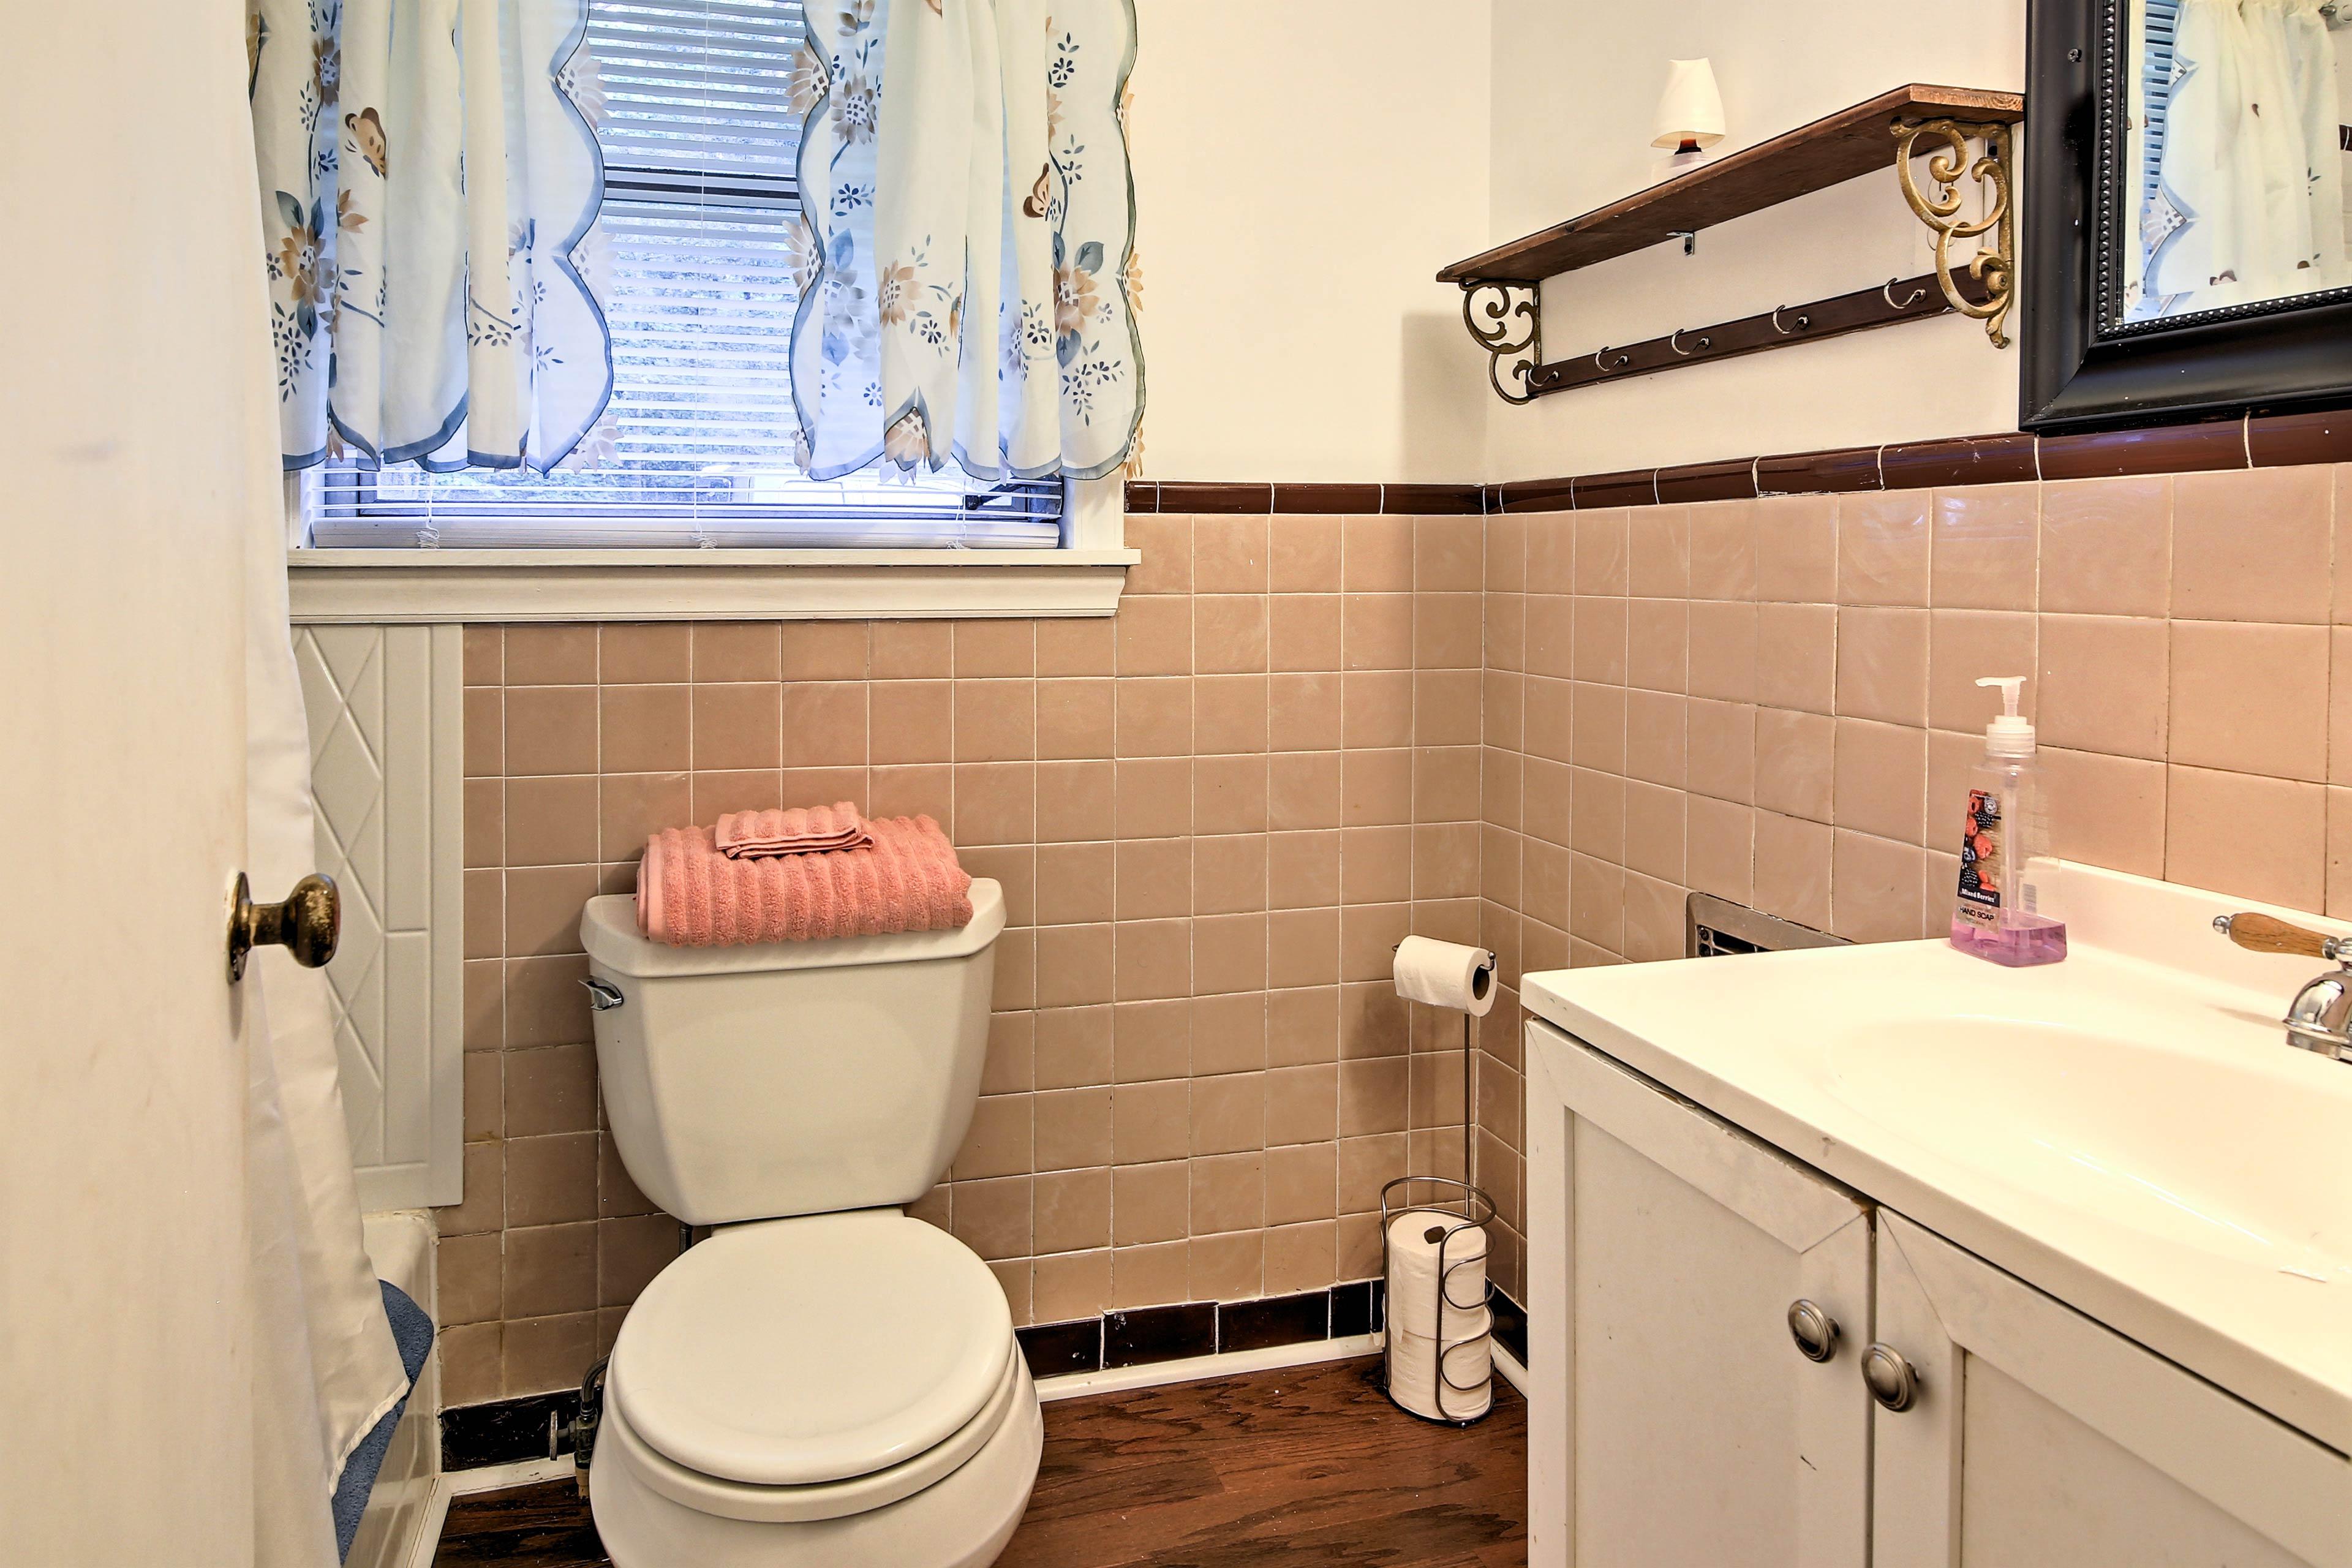 The en-suite bathroom boasts a shower/tub combo.